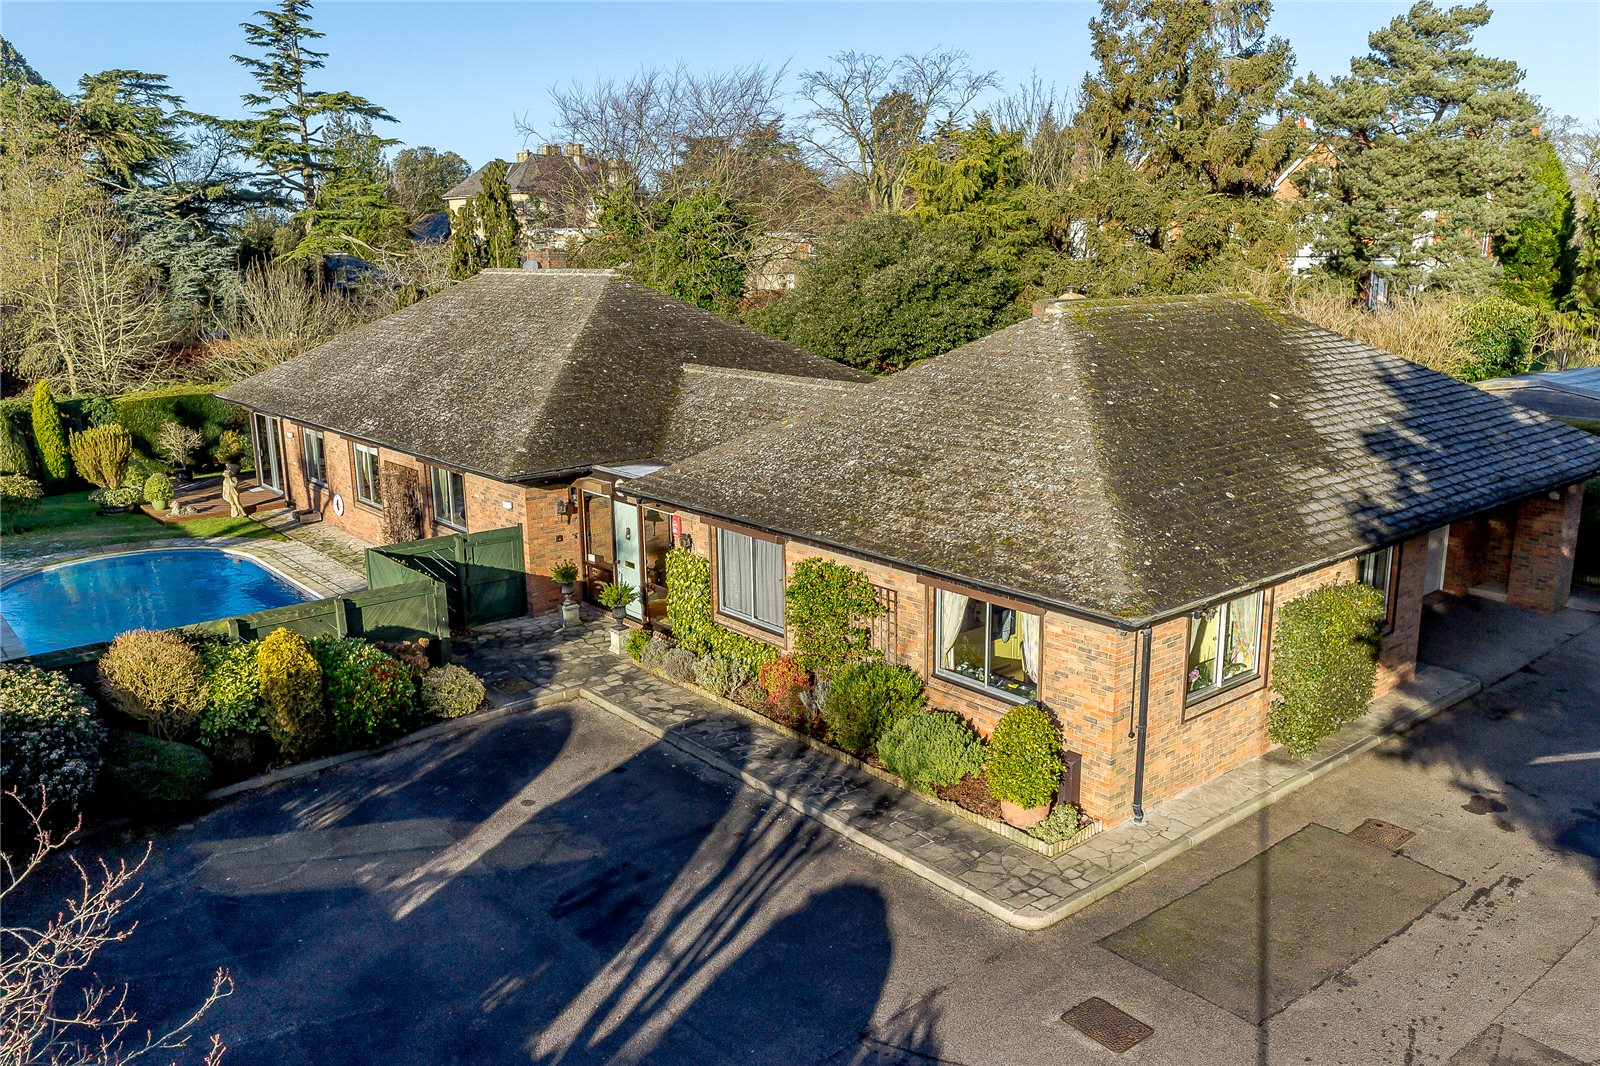 Villa per Vendita alle ore St. Edmunds Place, Ipswich, Suffolk, IP1 Ipswich, Inghilterra